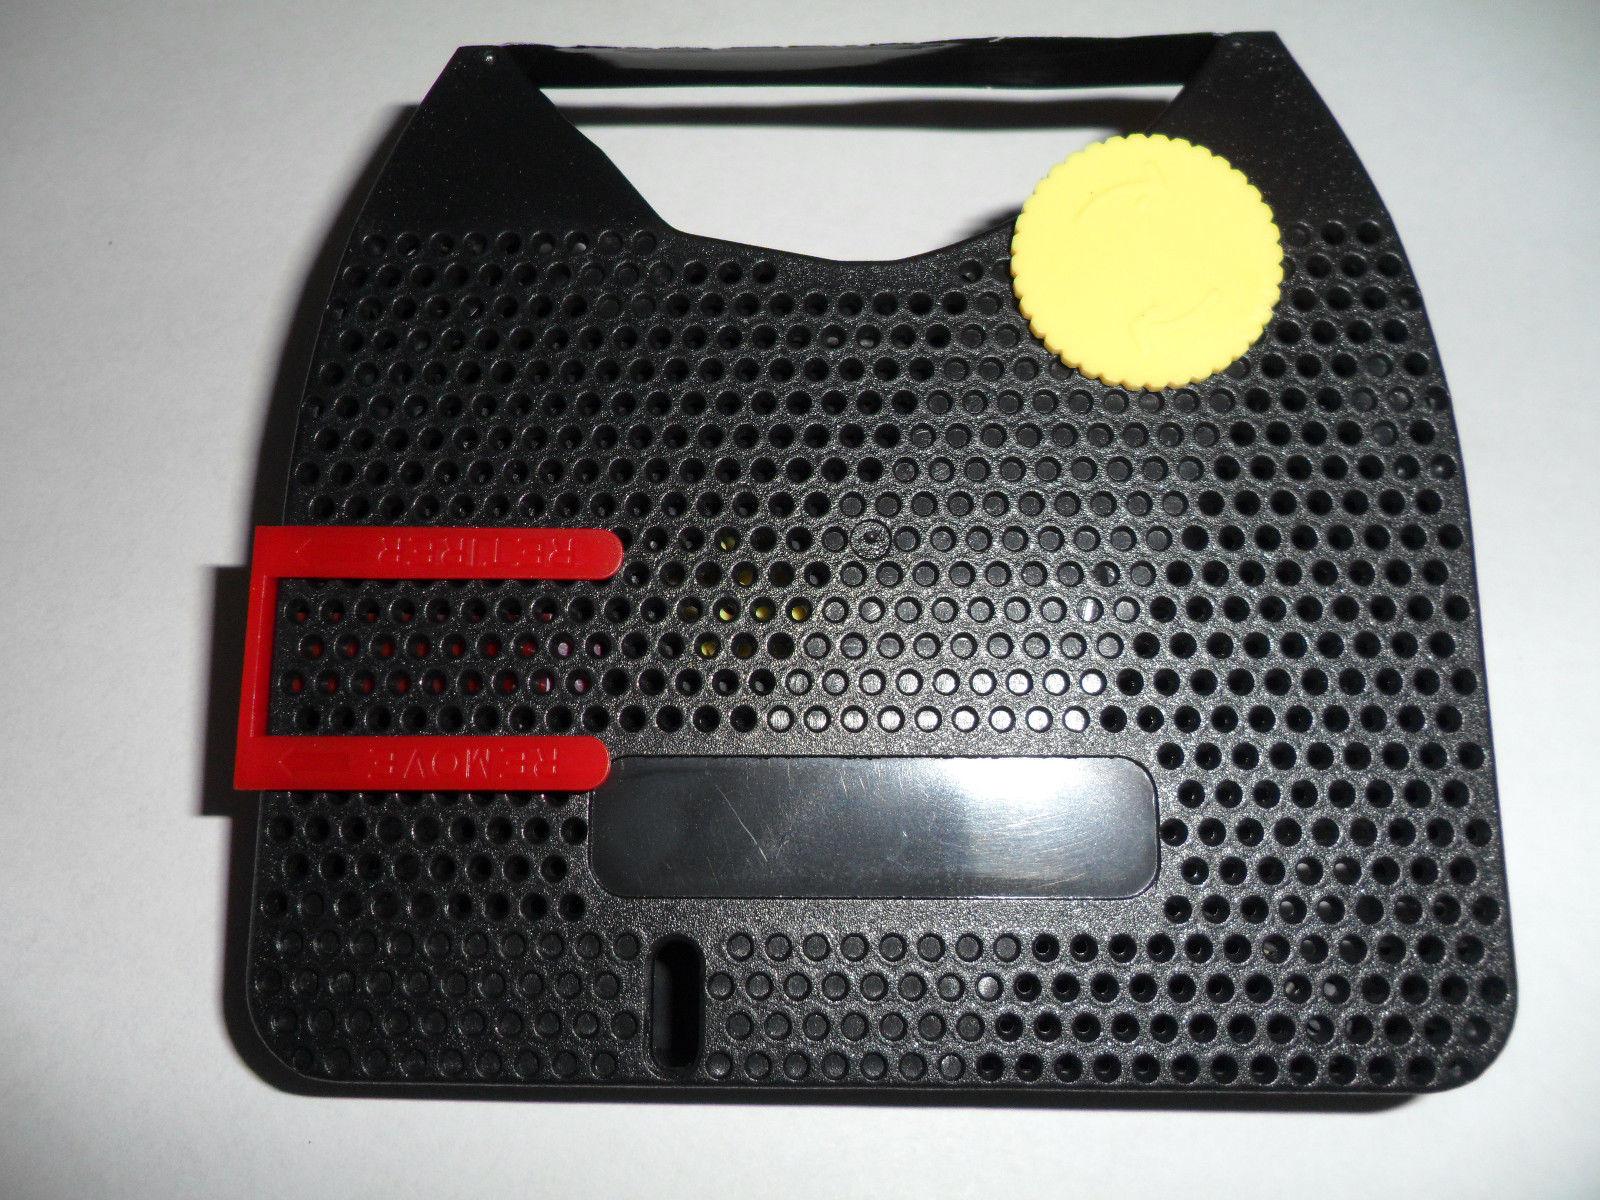 Smith Corona PWP 365DS PWP 370LT Typewriter Ribbon (2 Pack) Replaces 21000